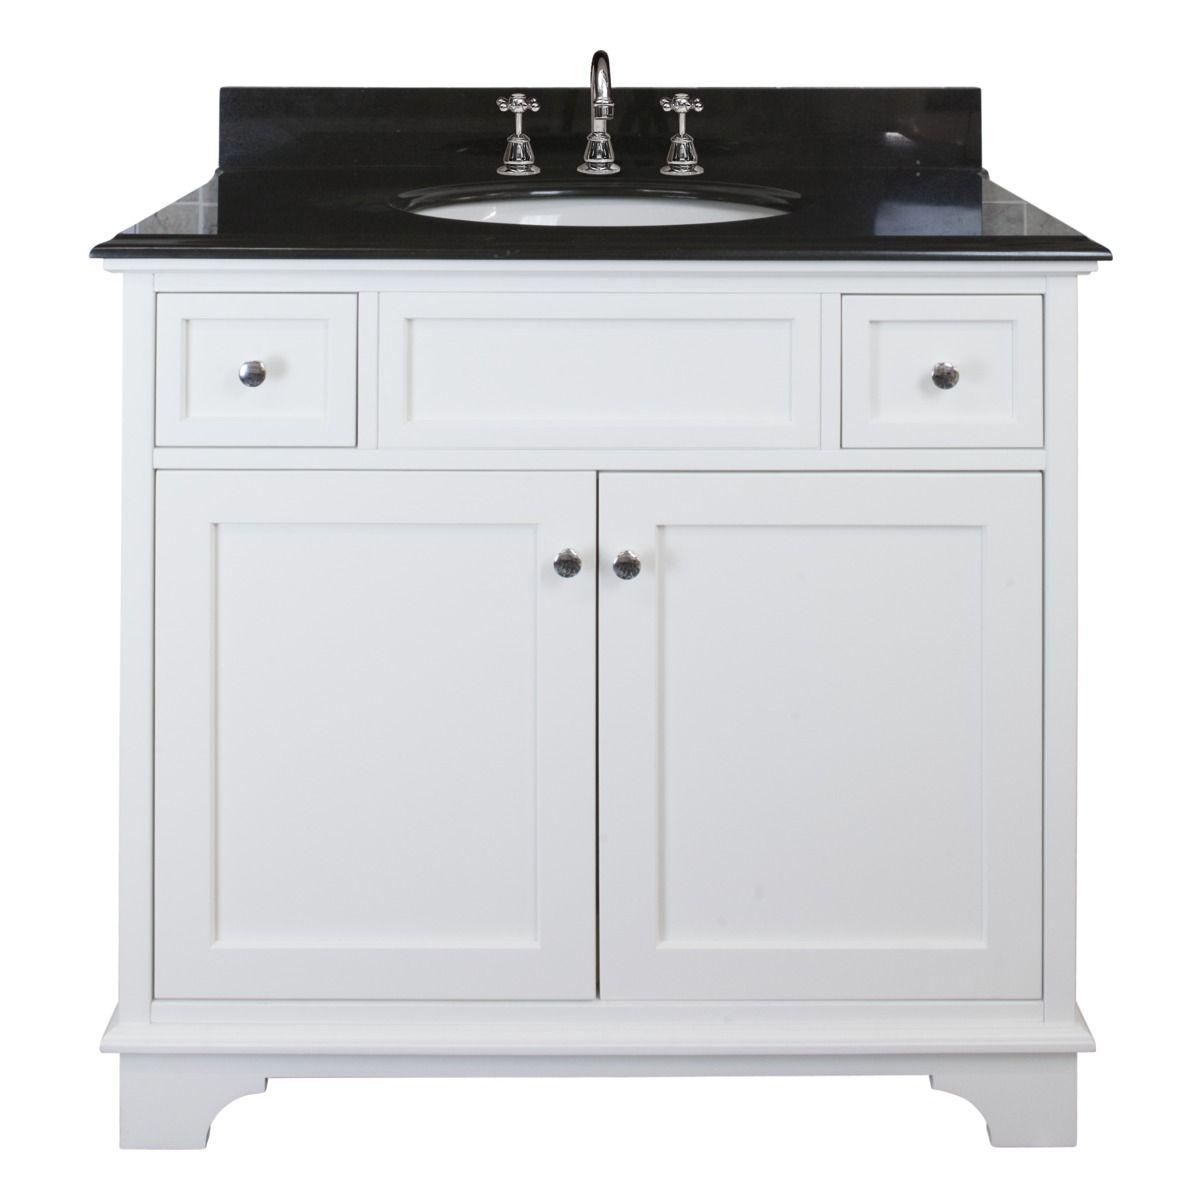 New York Medium Single Vanity in White with Black Granite. From ...